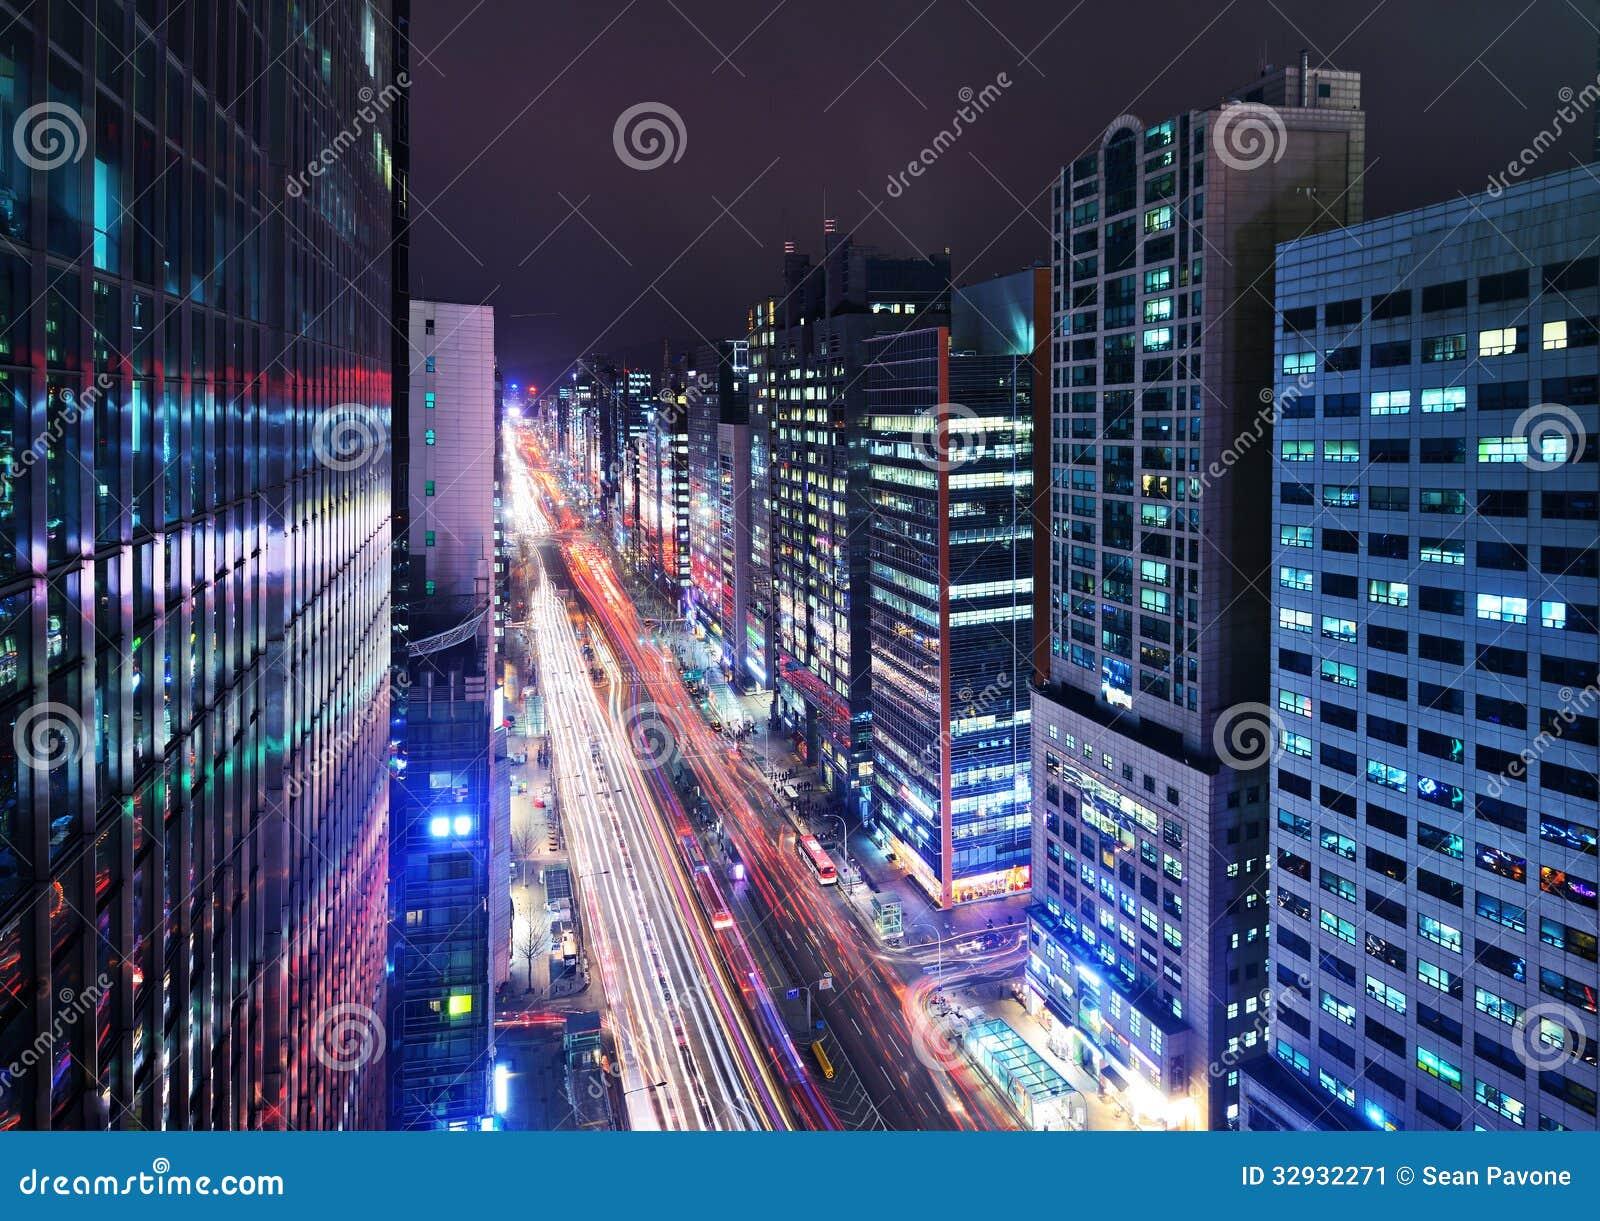 Seoul Gangnam District Cityscape Stock Image - Image: 32932271